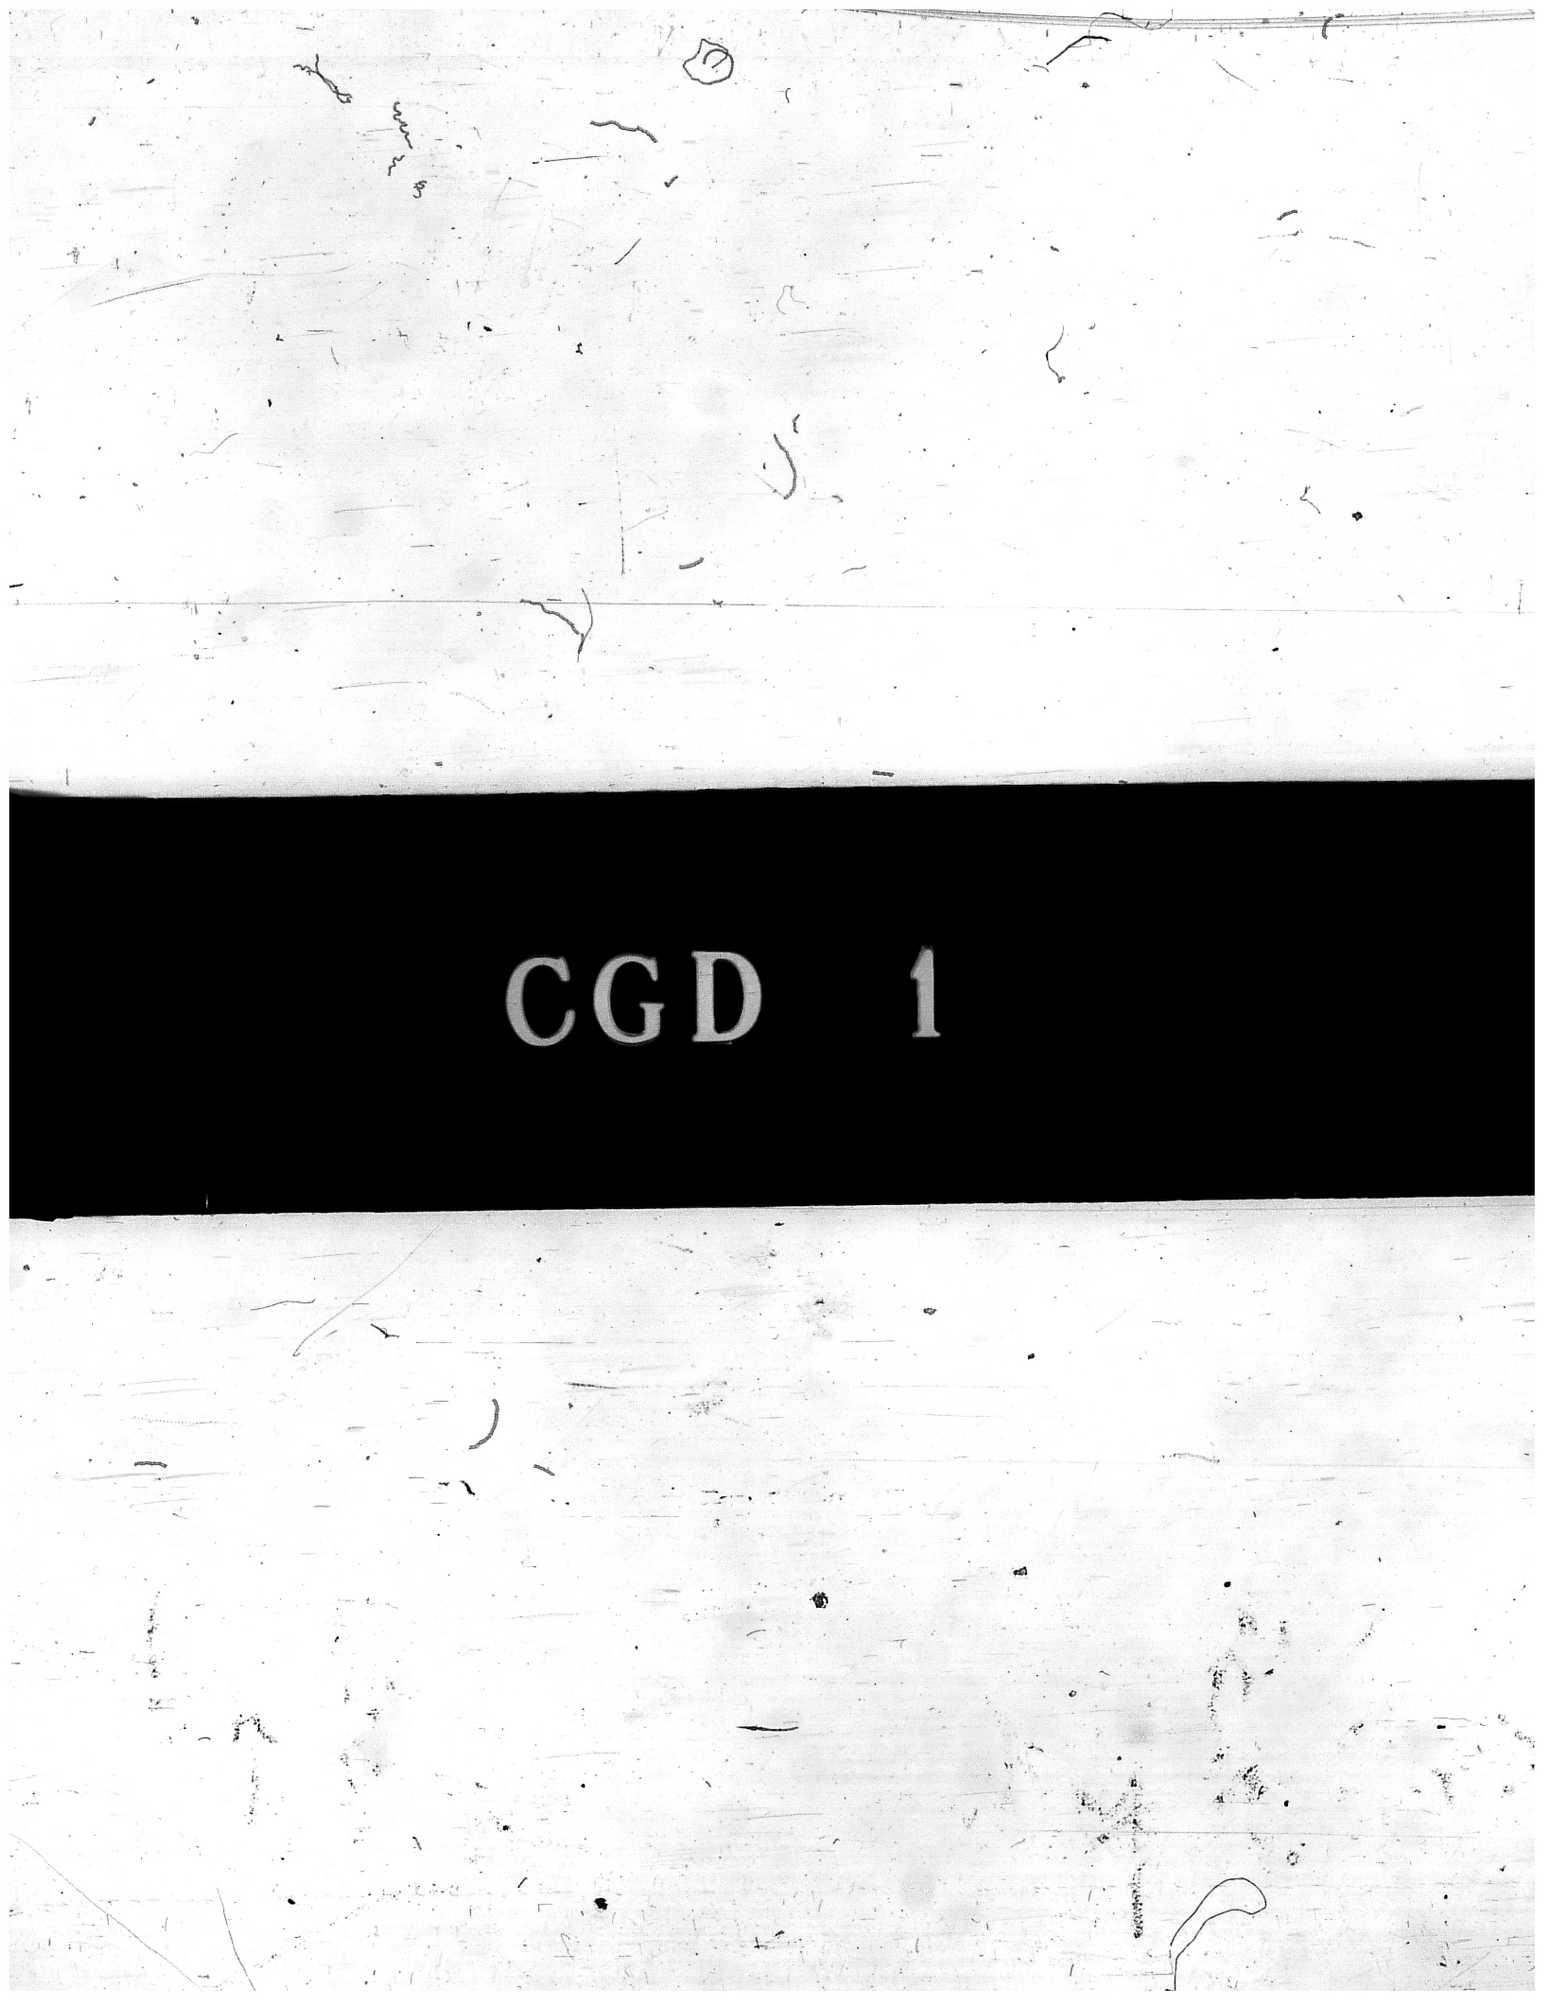 Captured German Aeronautical Documents (CGD) Microfilm